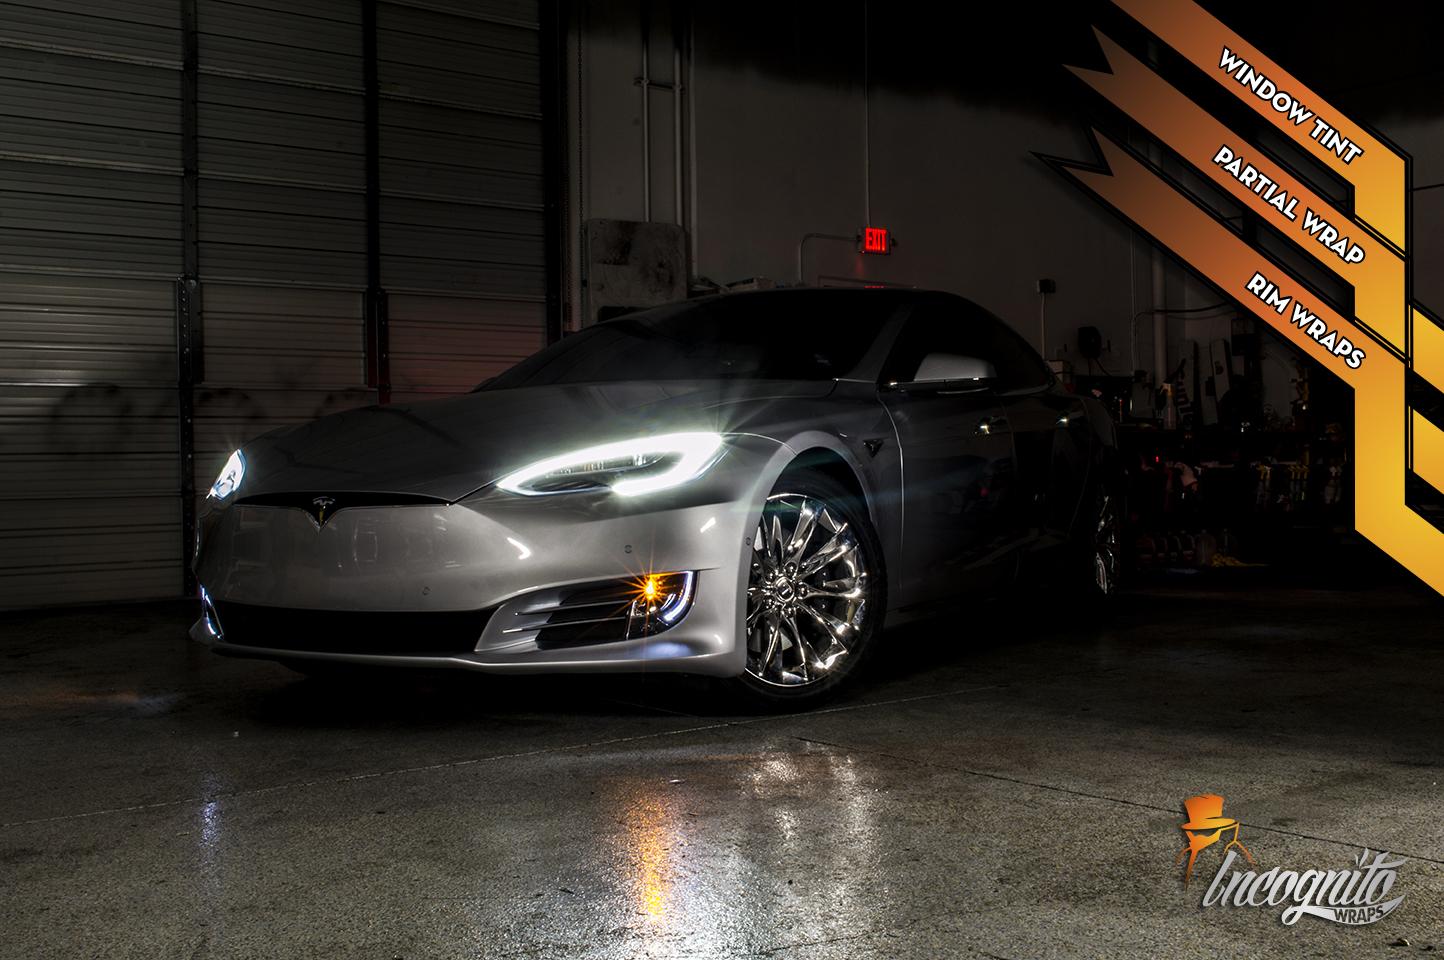 Tesla Model S - Chrome Rims and Black Top